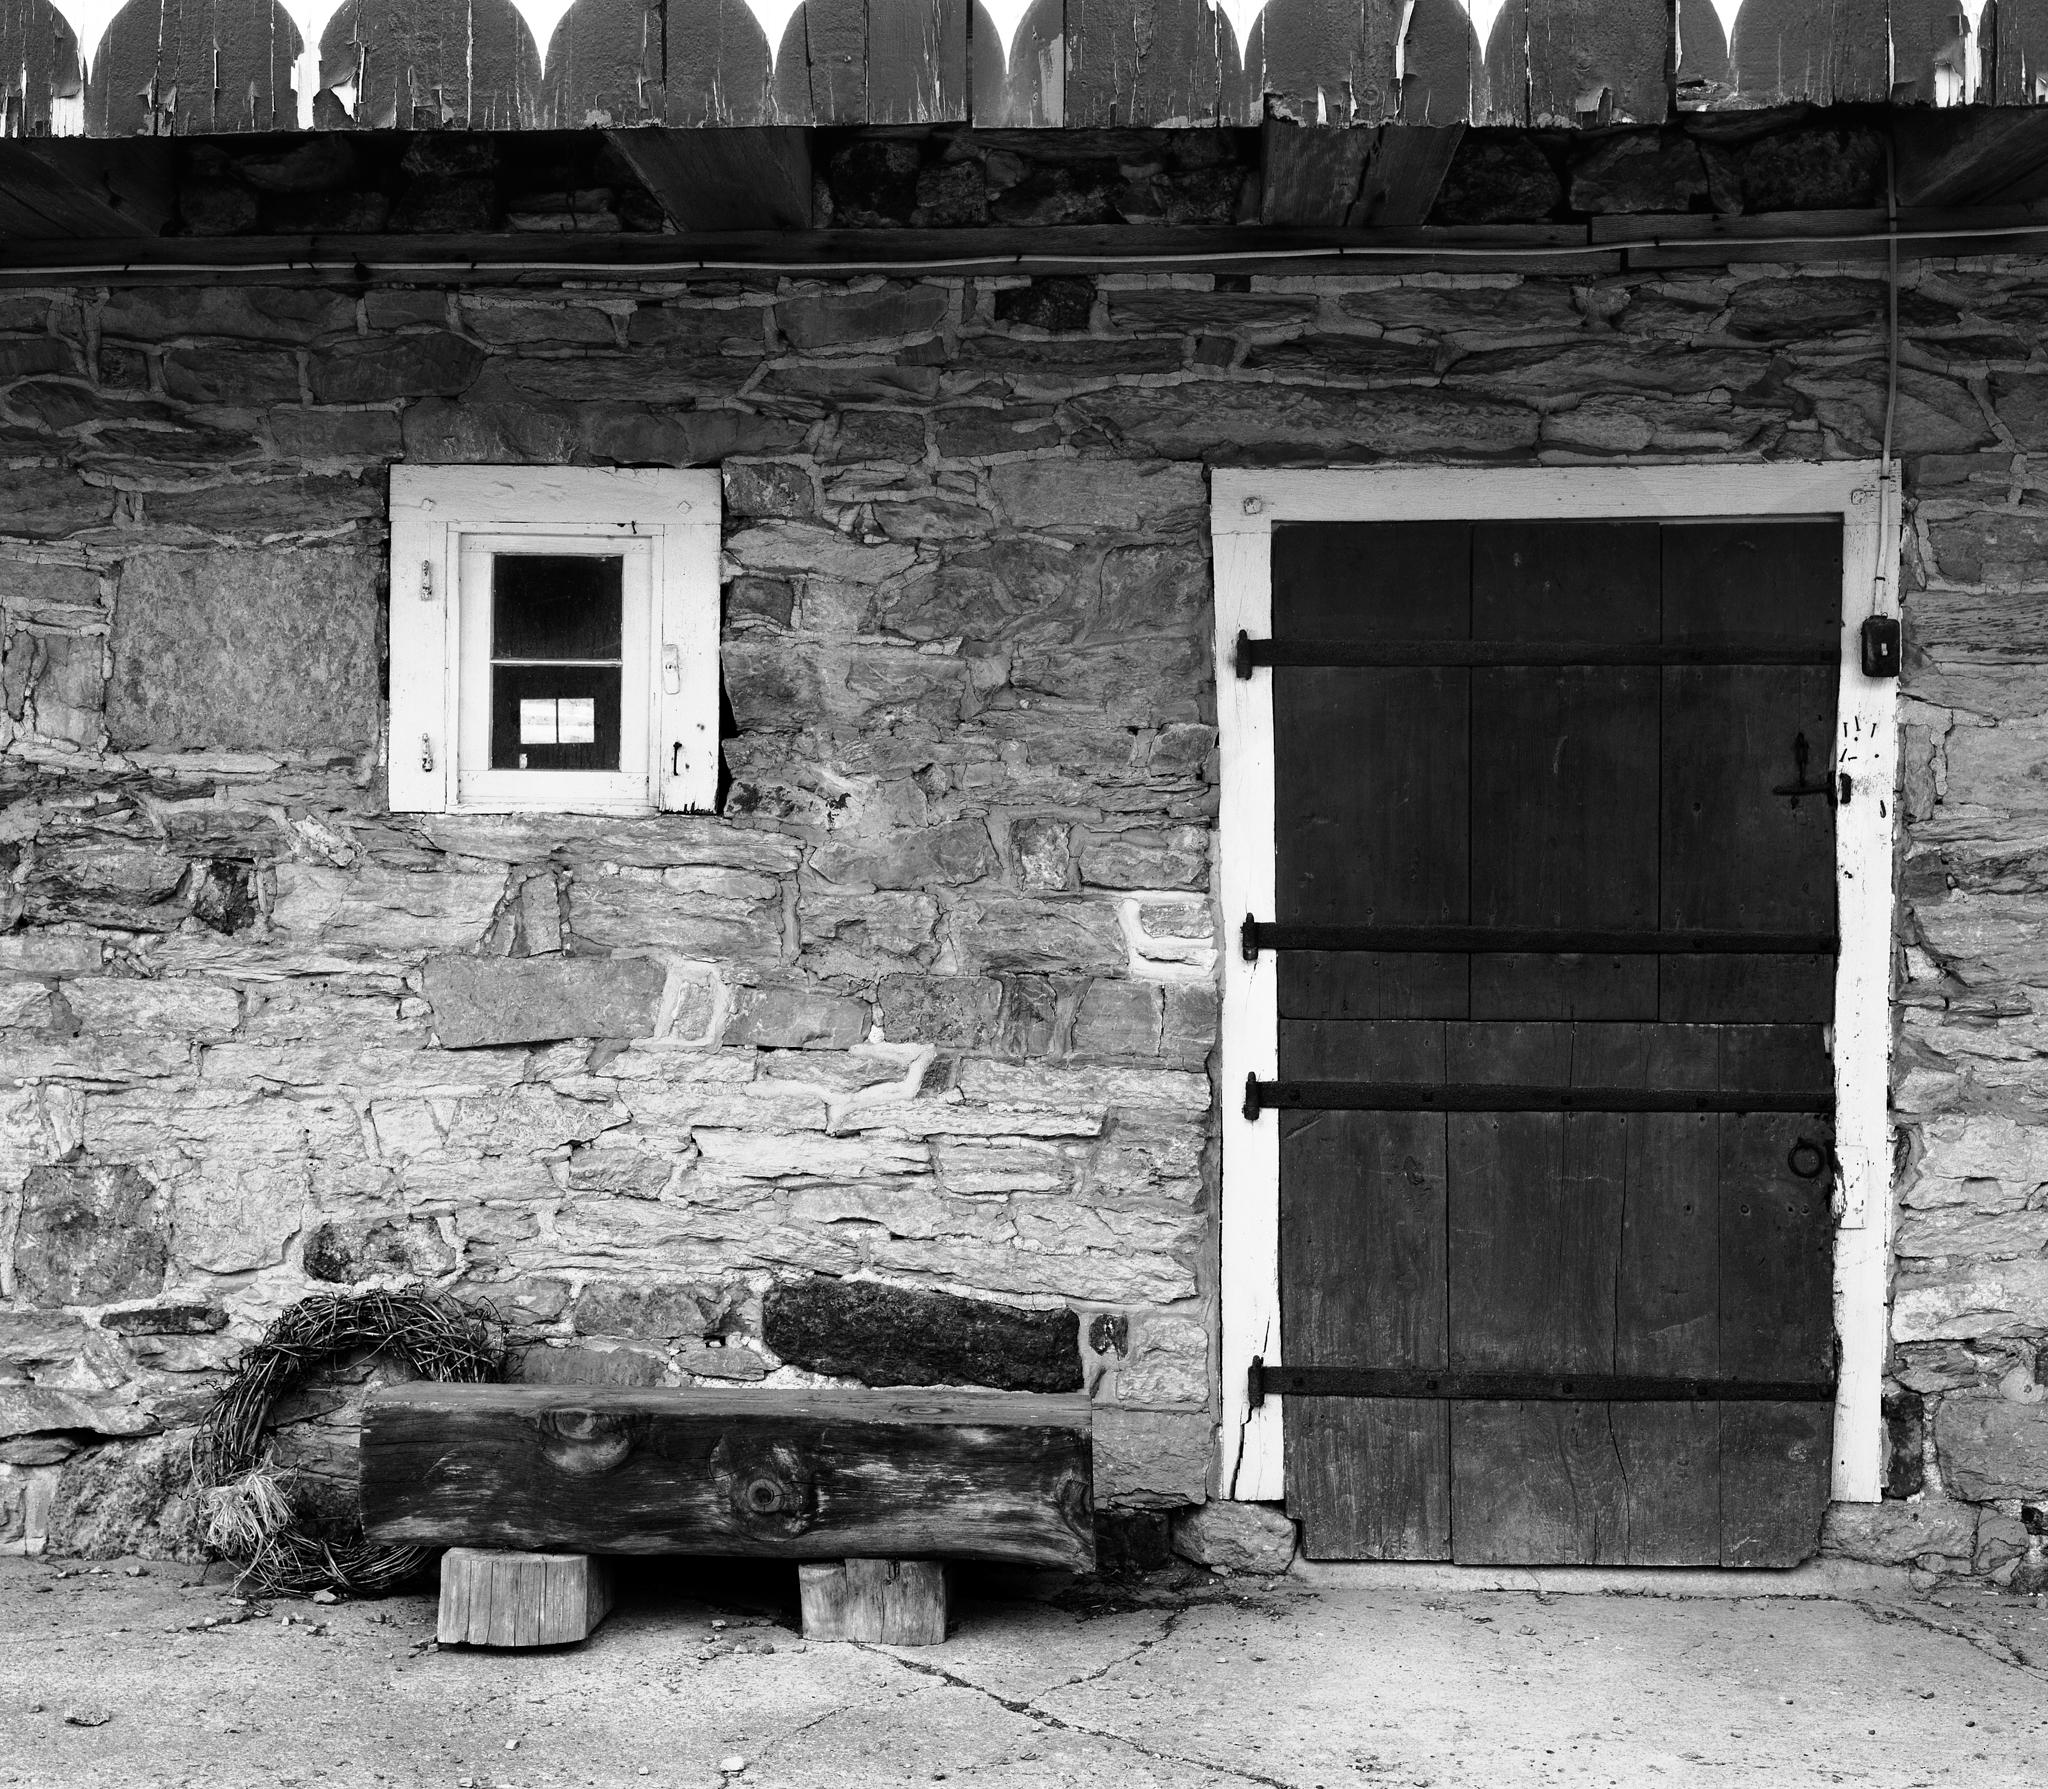 4x5_for_365_project_088_Ktown_PA_German_Heritage_Ctr_barn.jpg